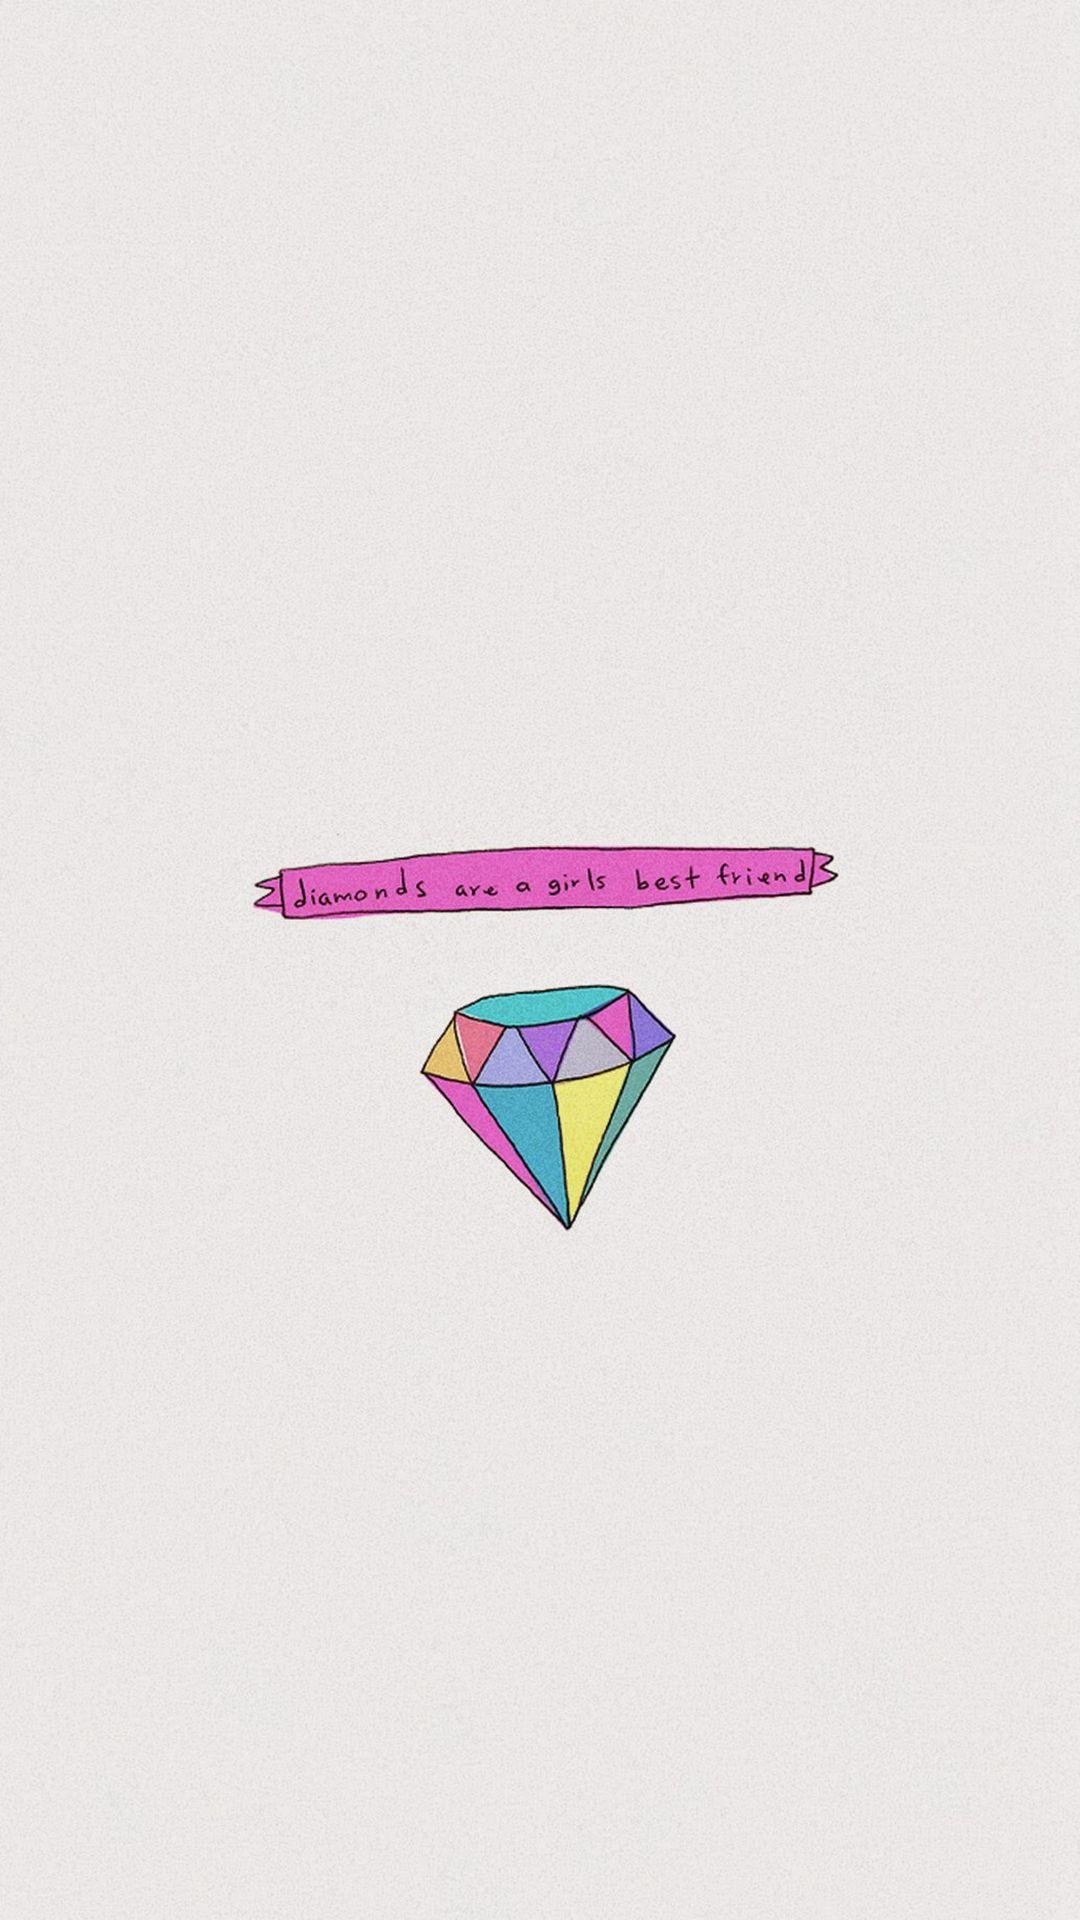 1080x1920 Diamonds Are A Girls Best Friend Hình nền iPhone 8 miễn phí